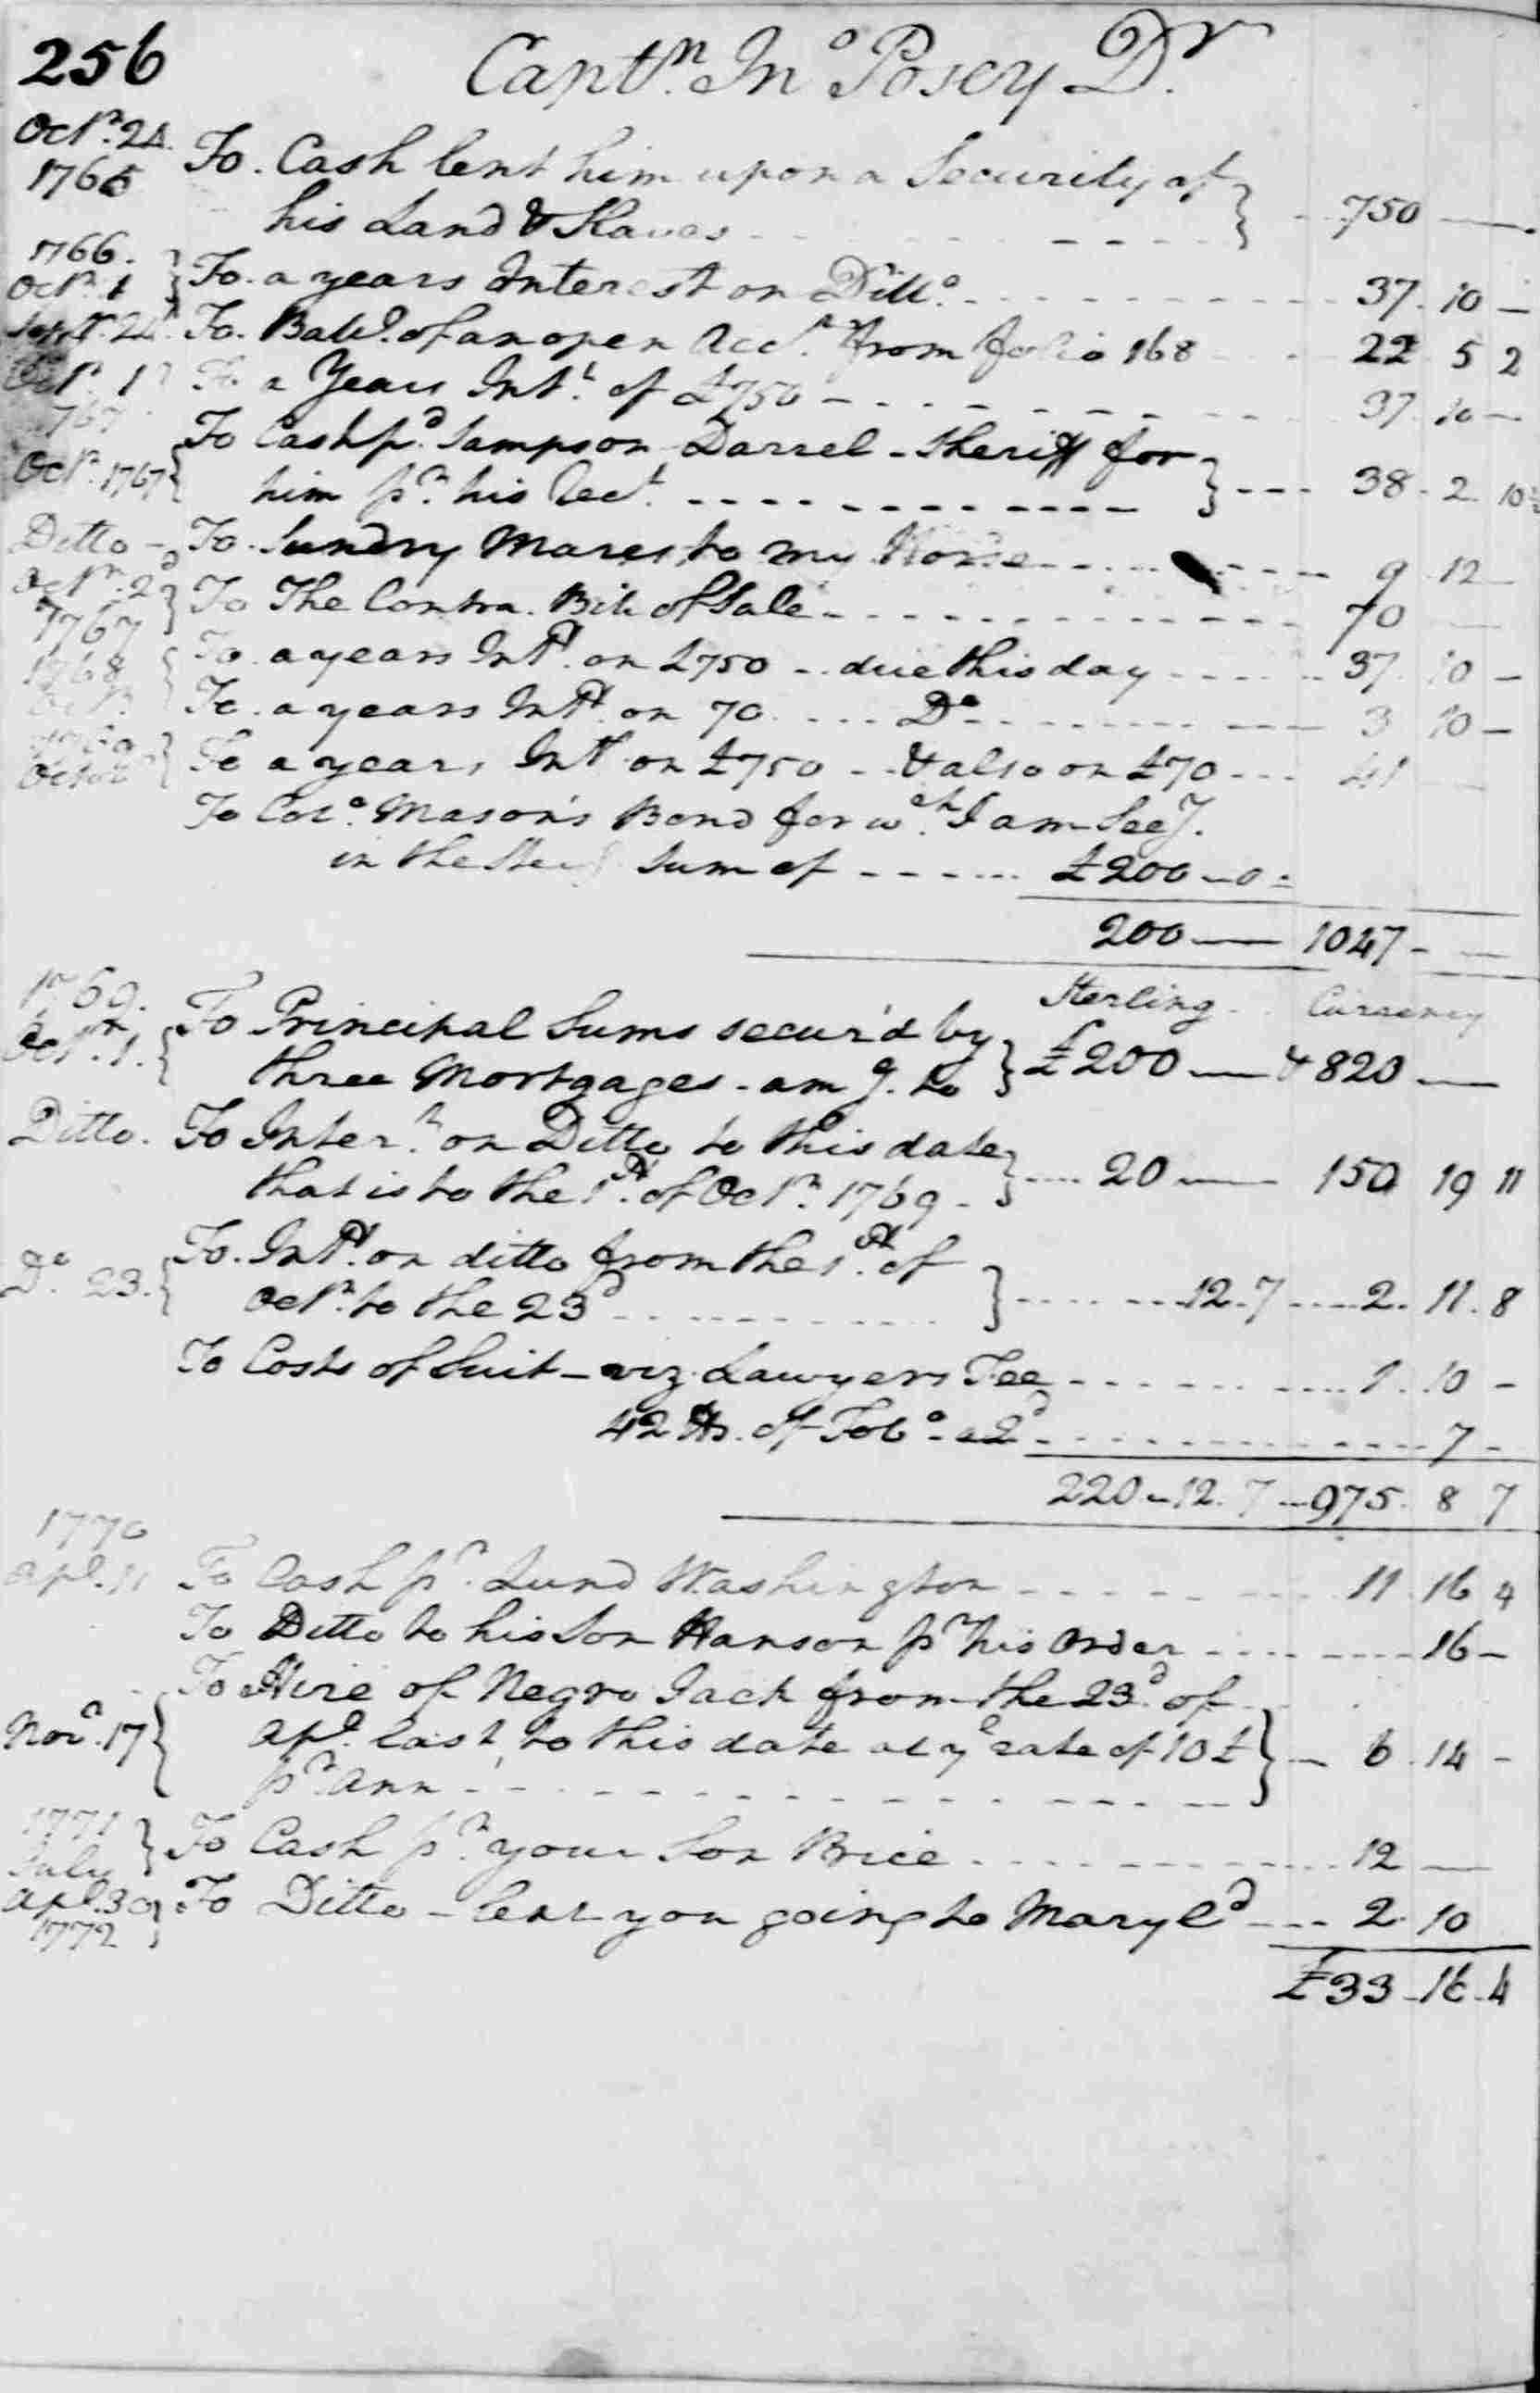 Ledger A, folio 256, left side